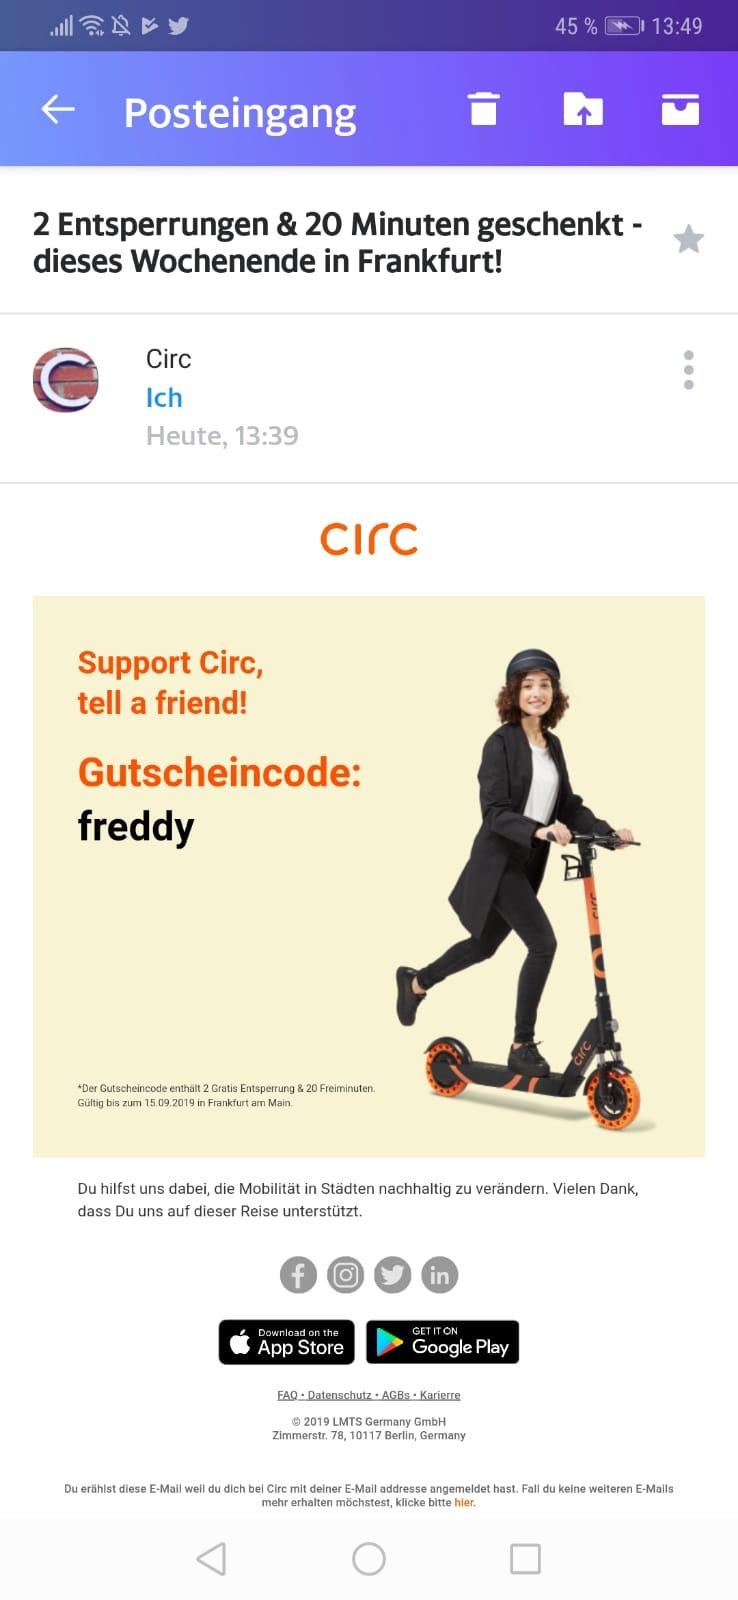 Circ E-Scooter auch Bestandskunden 2x gratis entsperren + 1x 20 Minuten gratis nur bis morgen